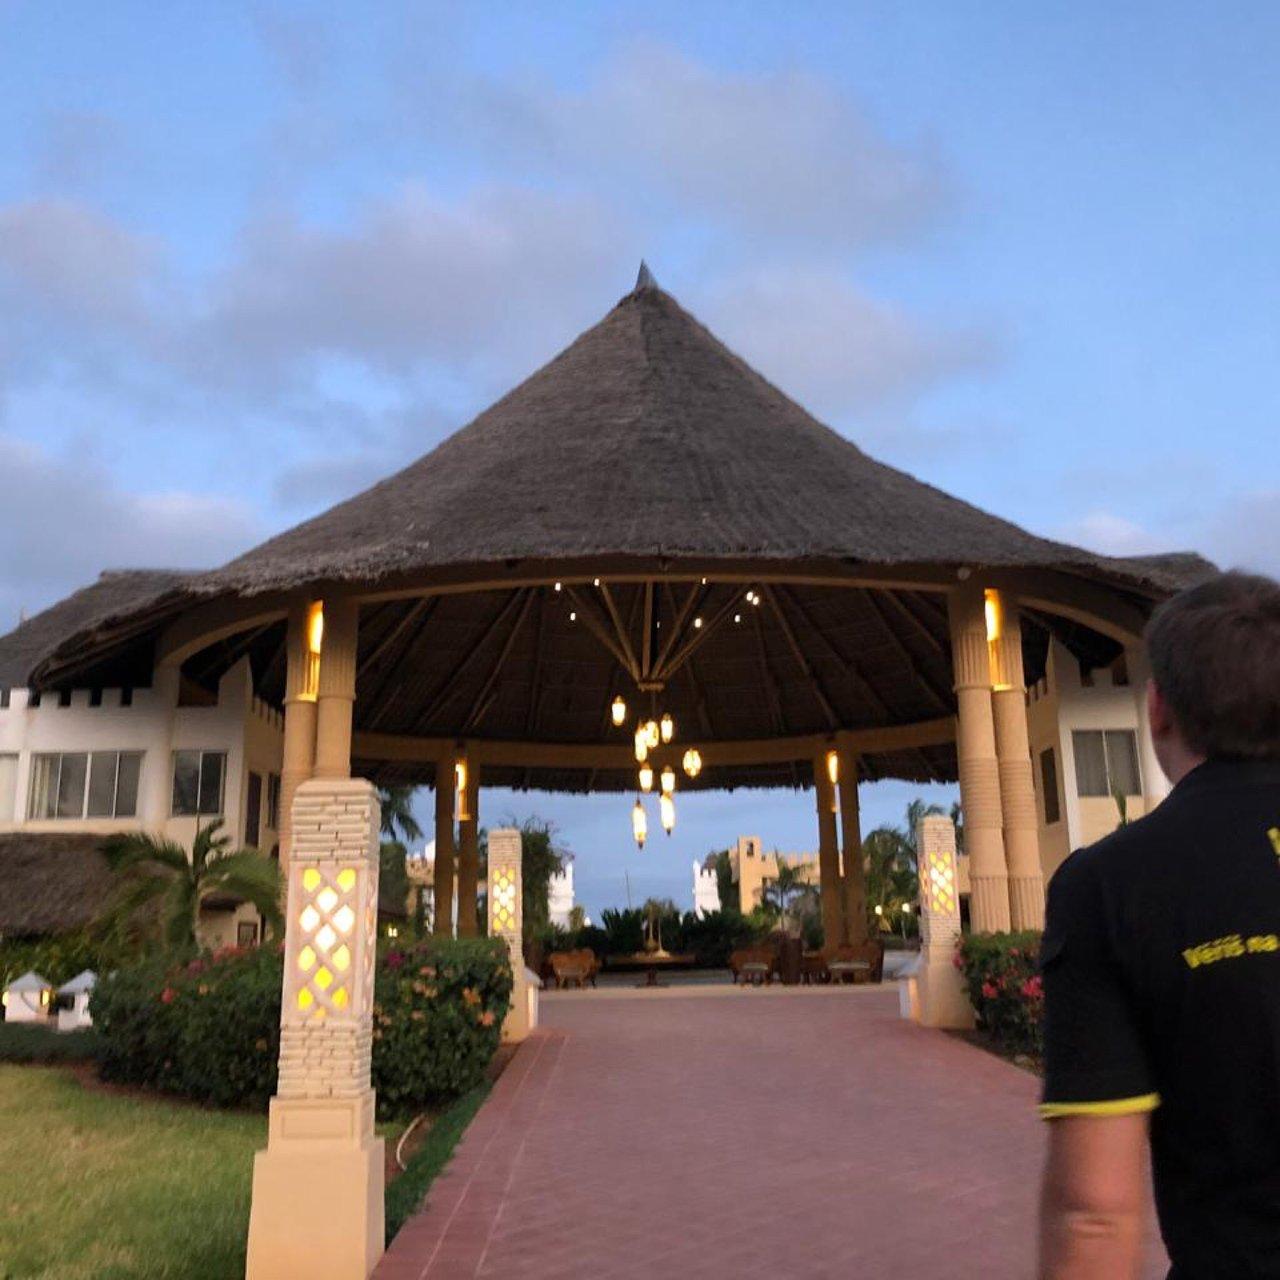 Balkon Dekoration Inspirierend Royal Zanzibar Beach Resort 5 Нунгви отзывы фото и